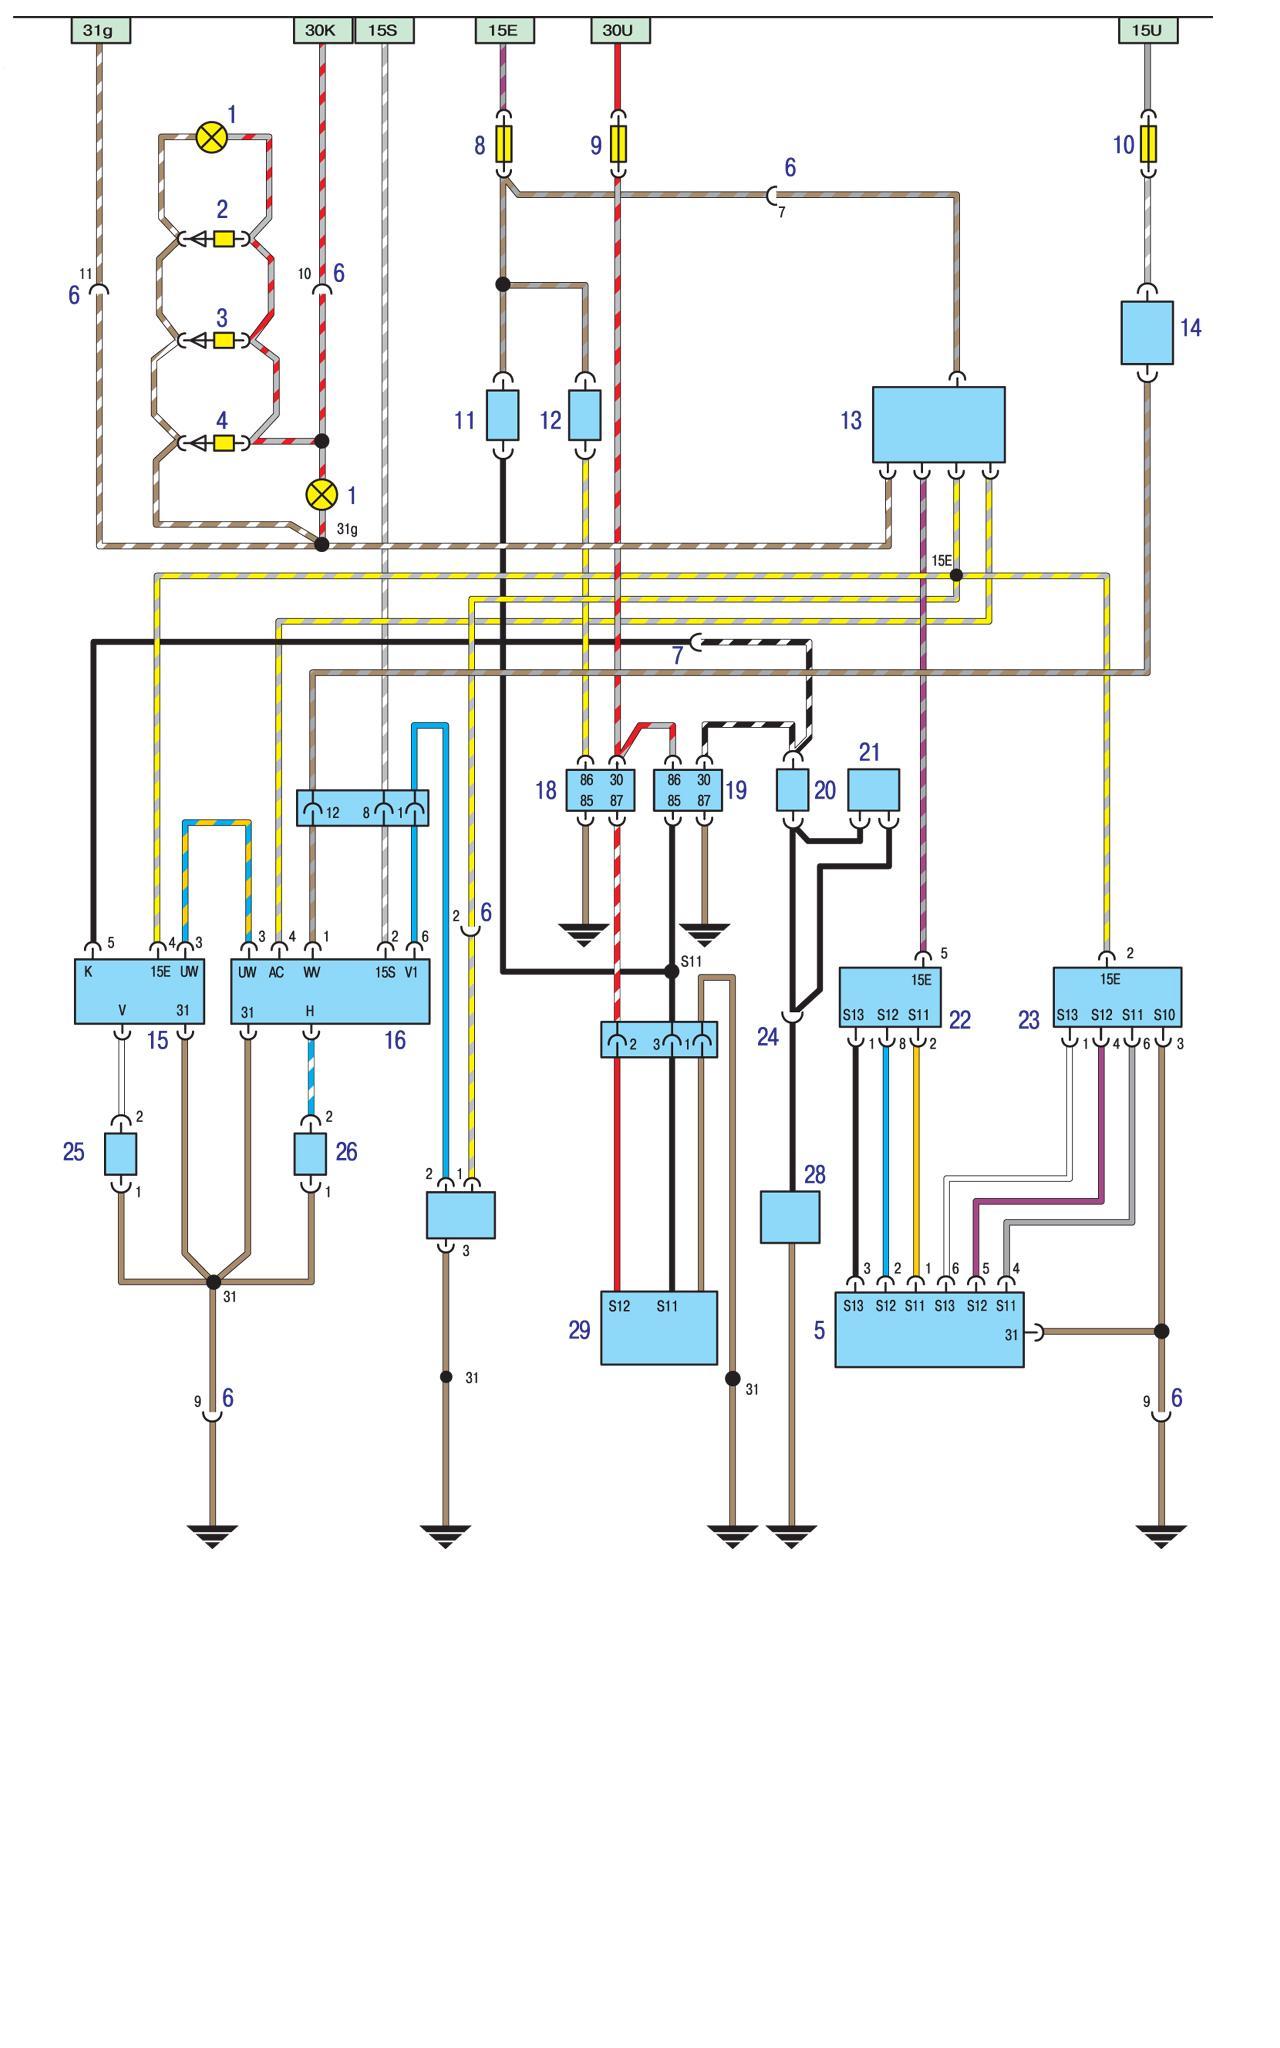 реле бензонасоса бмв е34 м40 схема